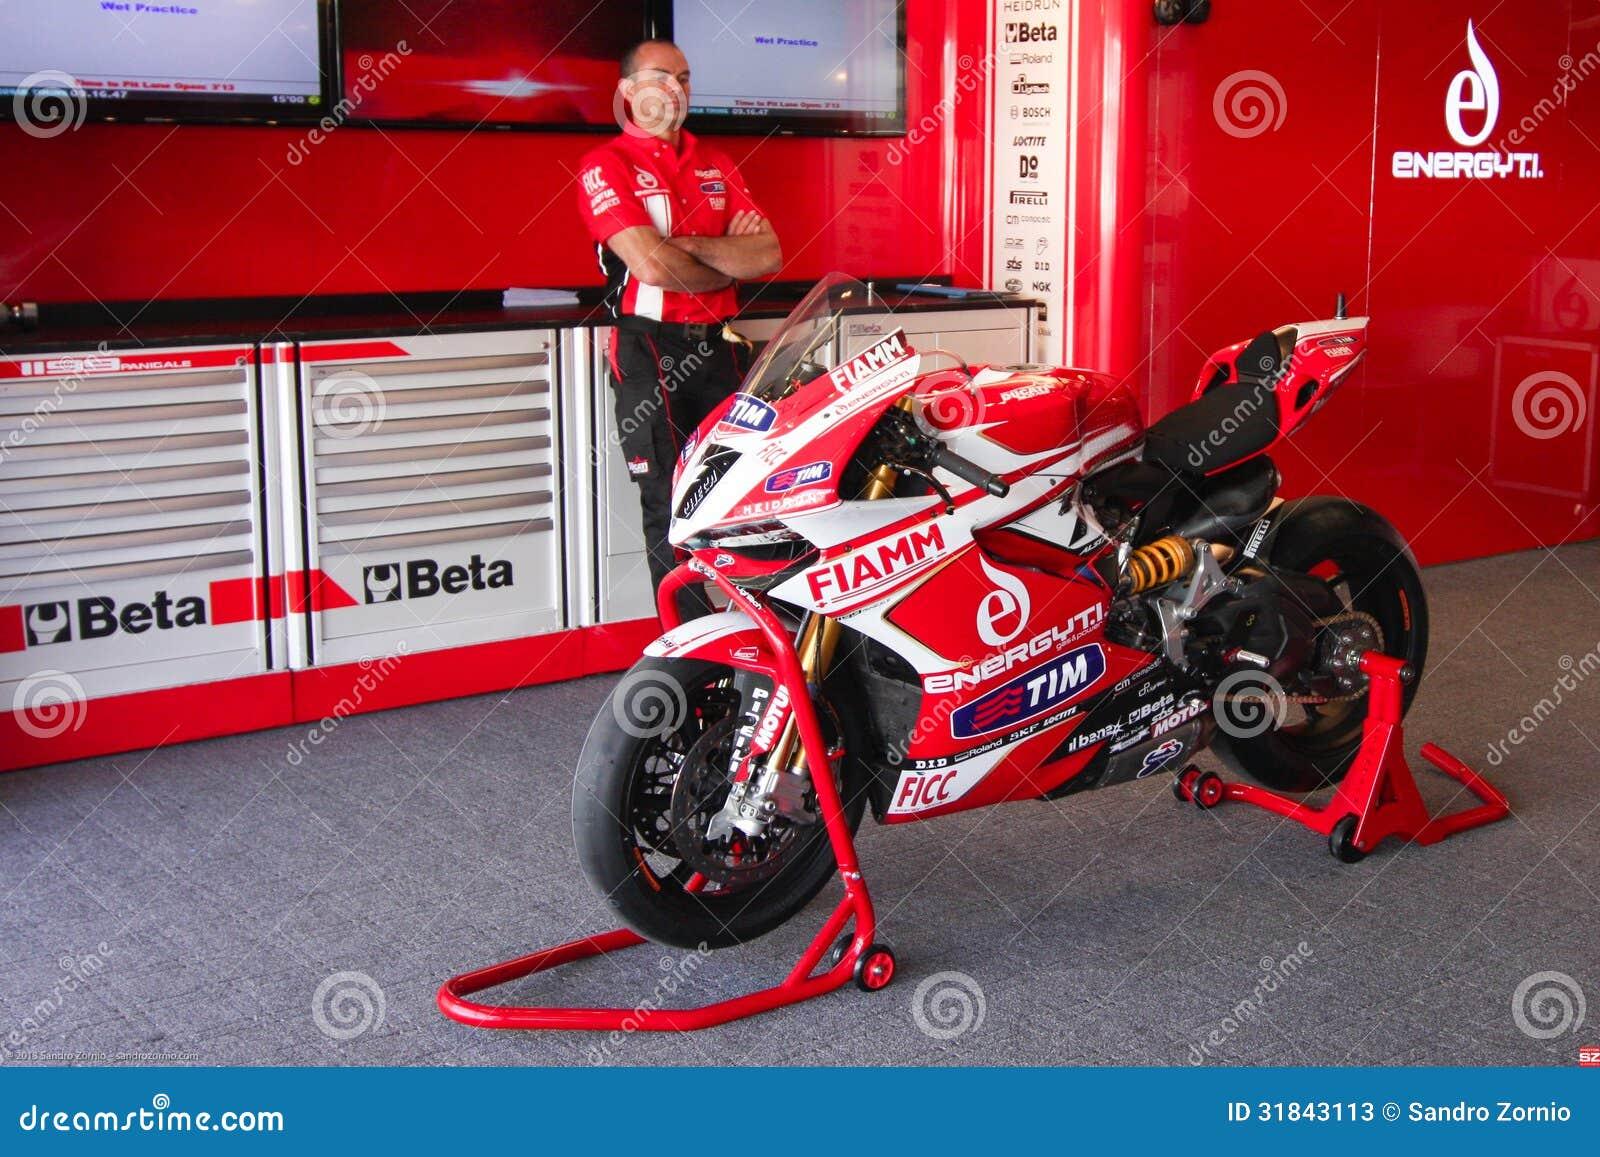 Ducati 1199 Panigale R Team Ducati Alstare Superbike WSBK